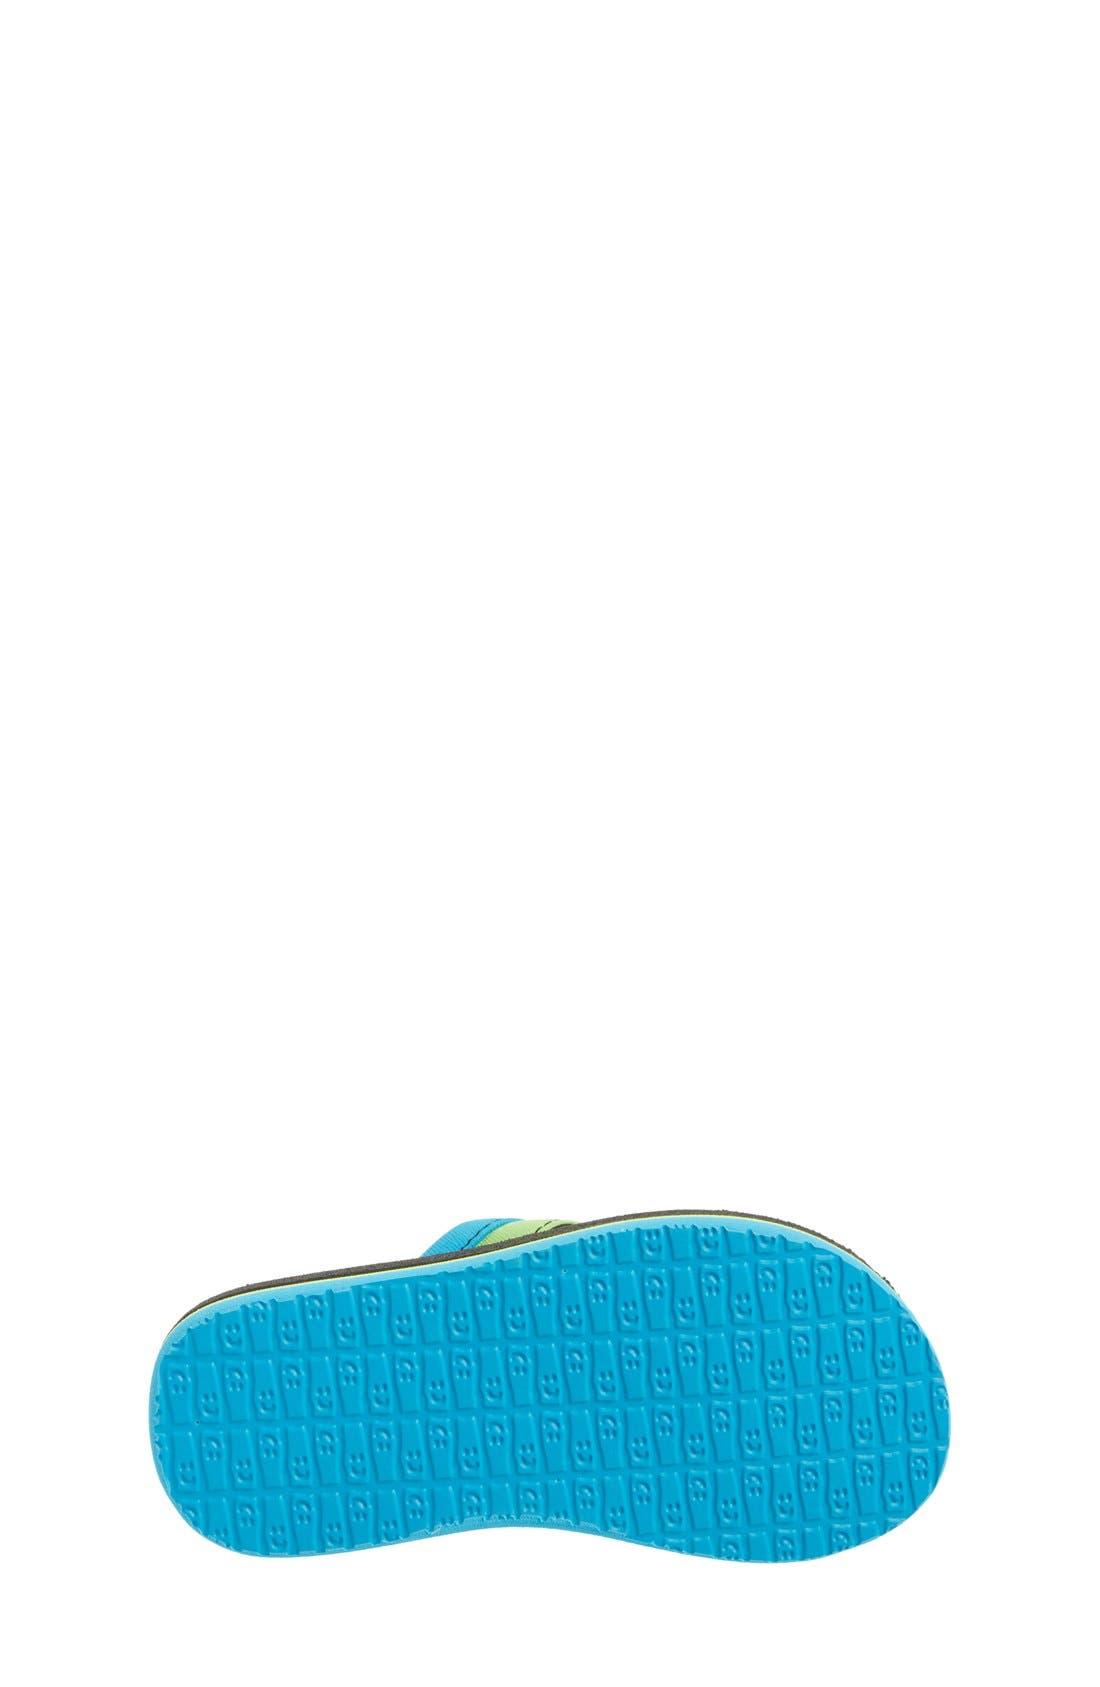 'Rootbeer Cozy' Lightweight Flip Flop Sandal,                             Alternate thumbnail 9, color,